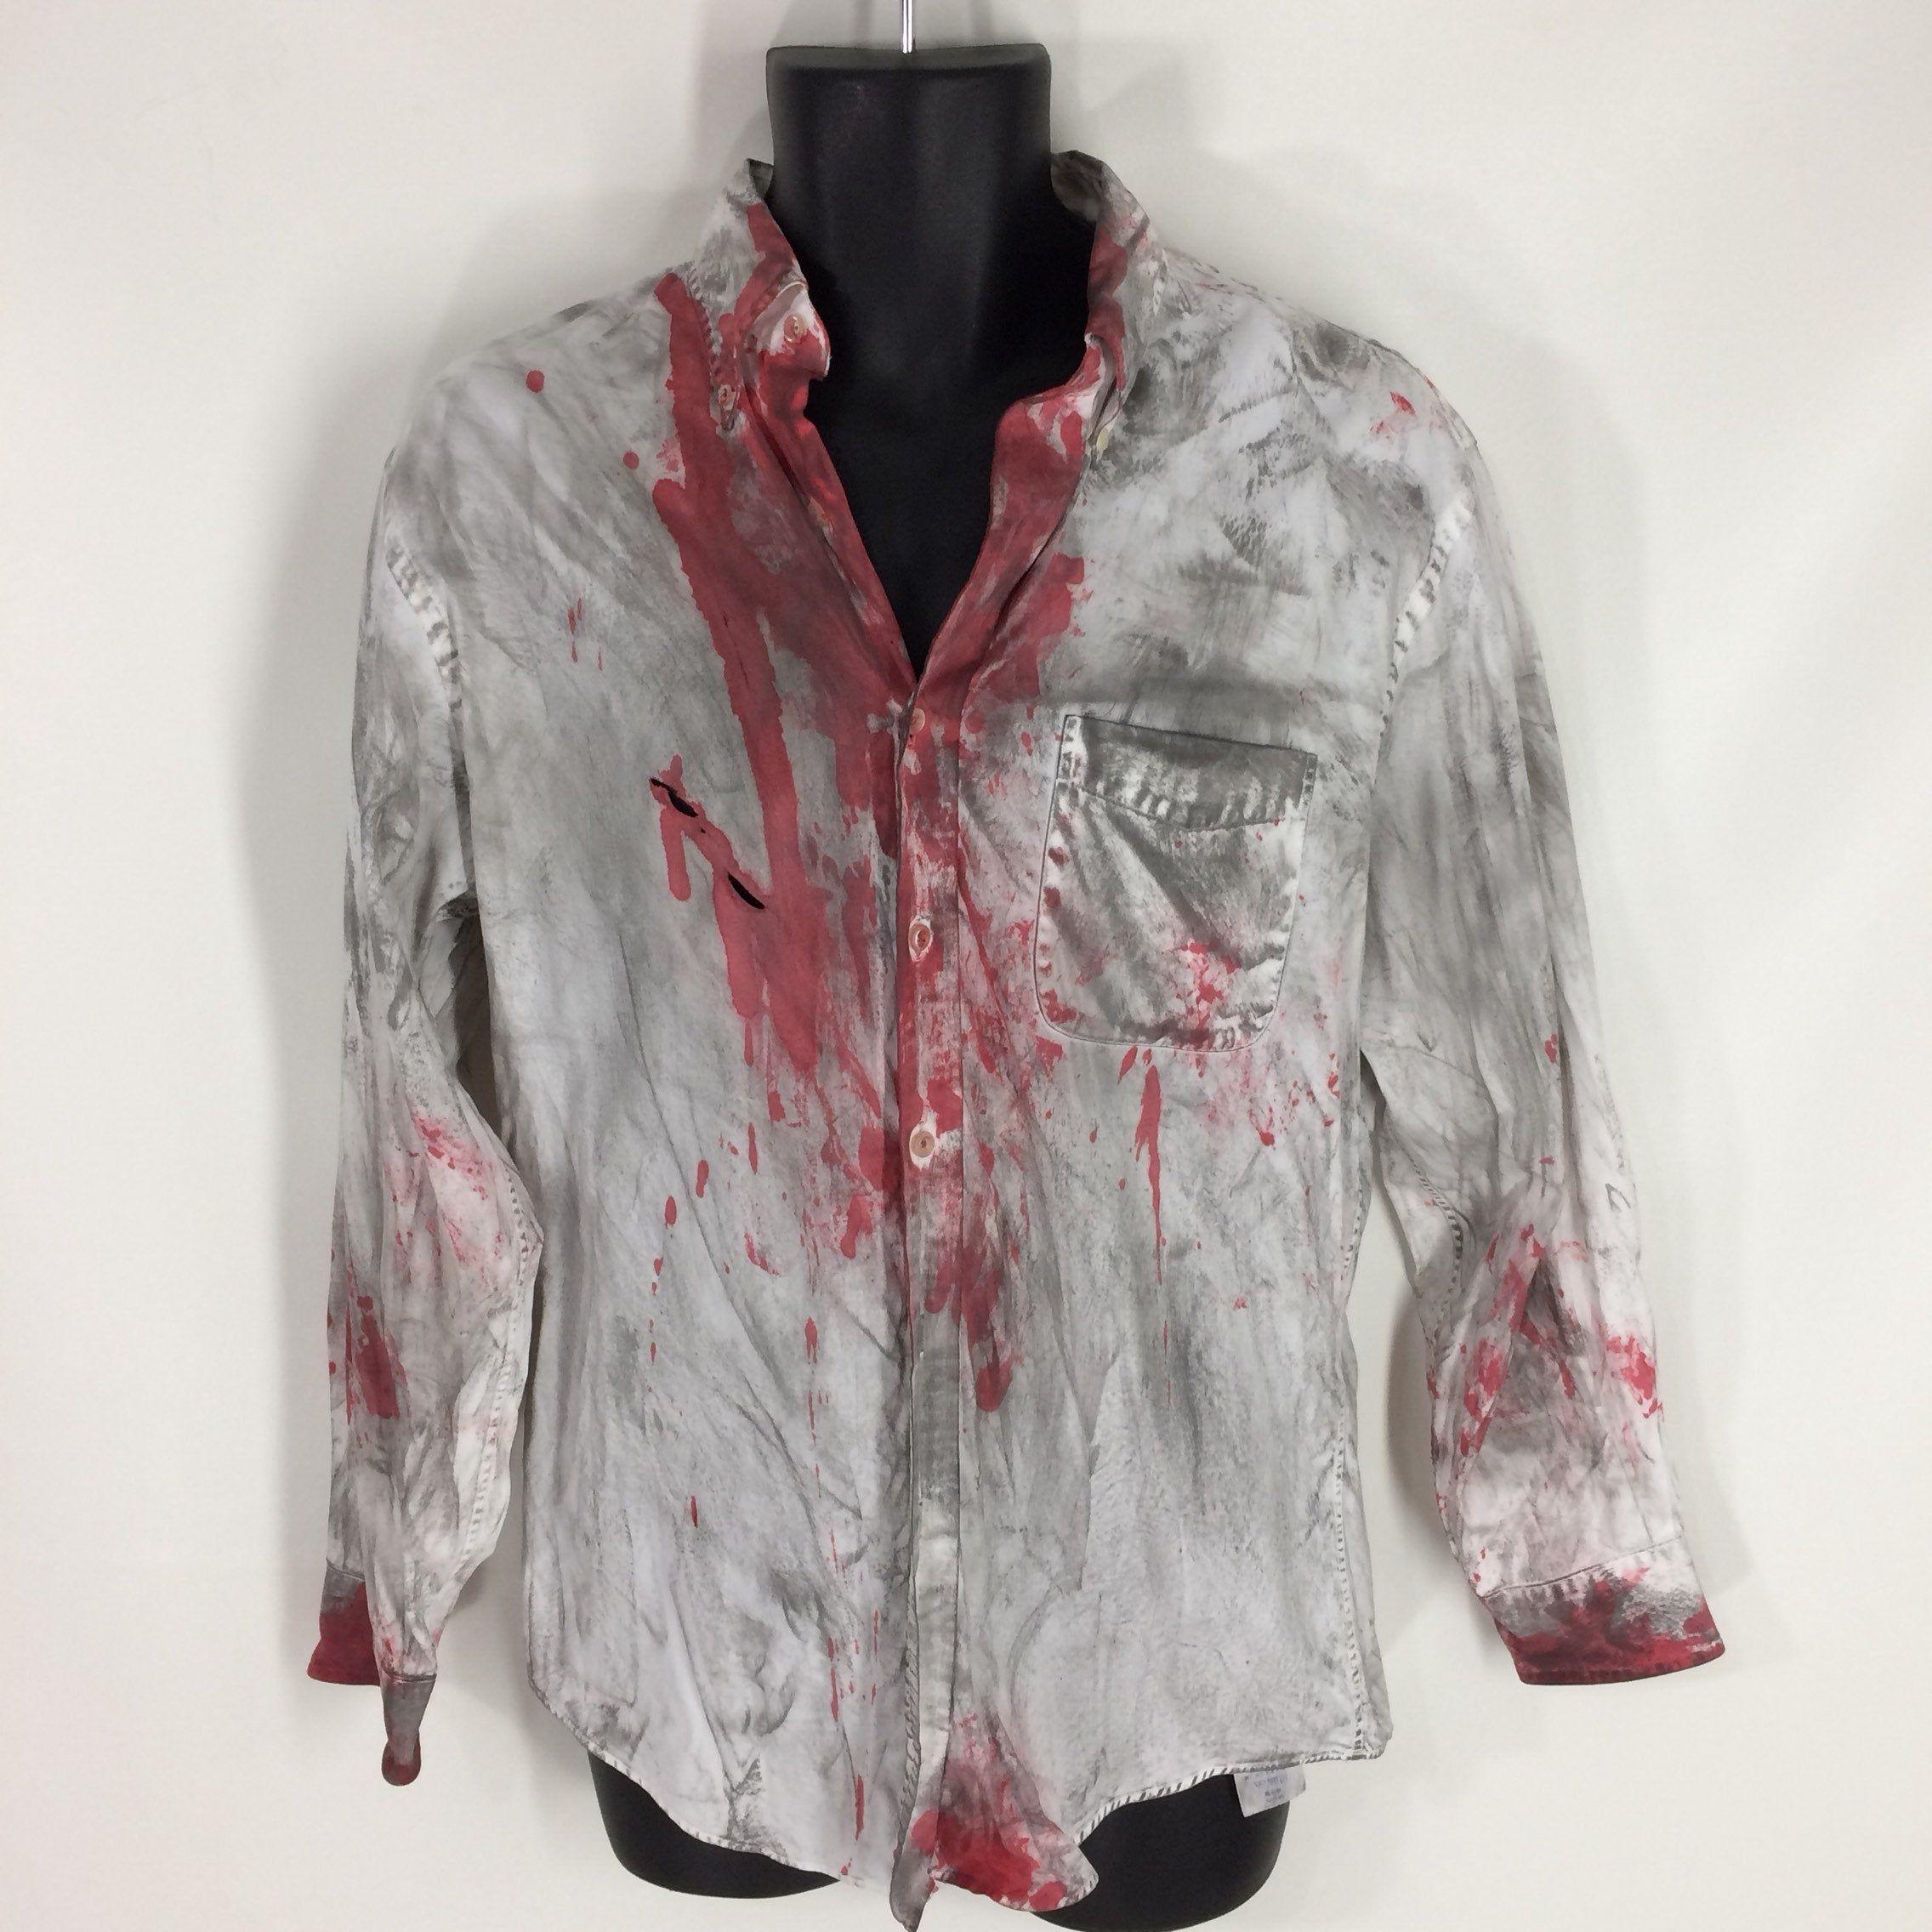 Halloween Costume Man Zombie Shirt XL 40-42